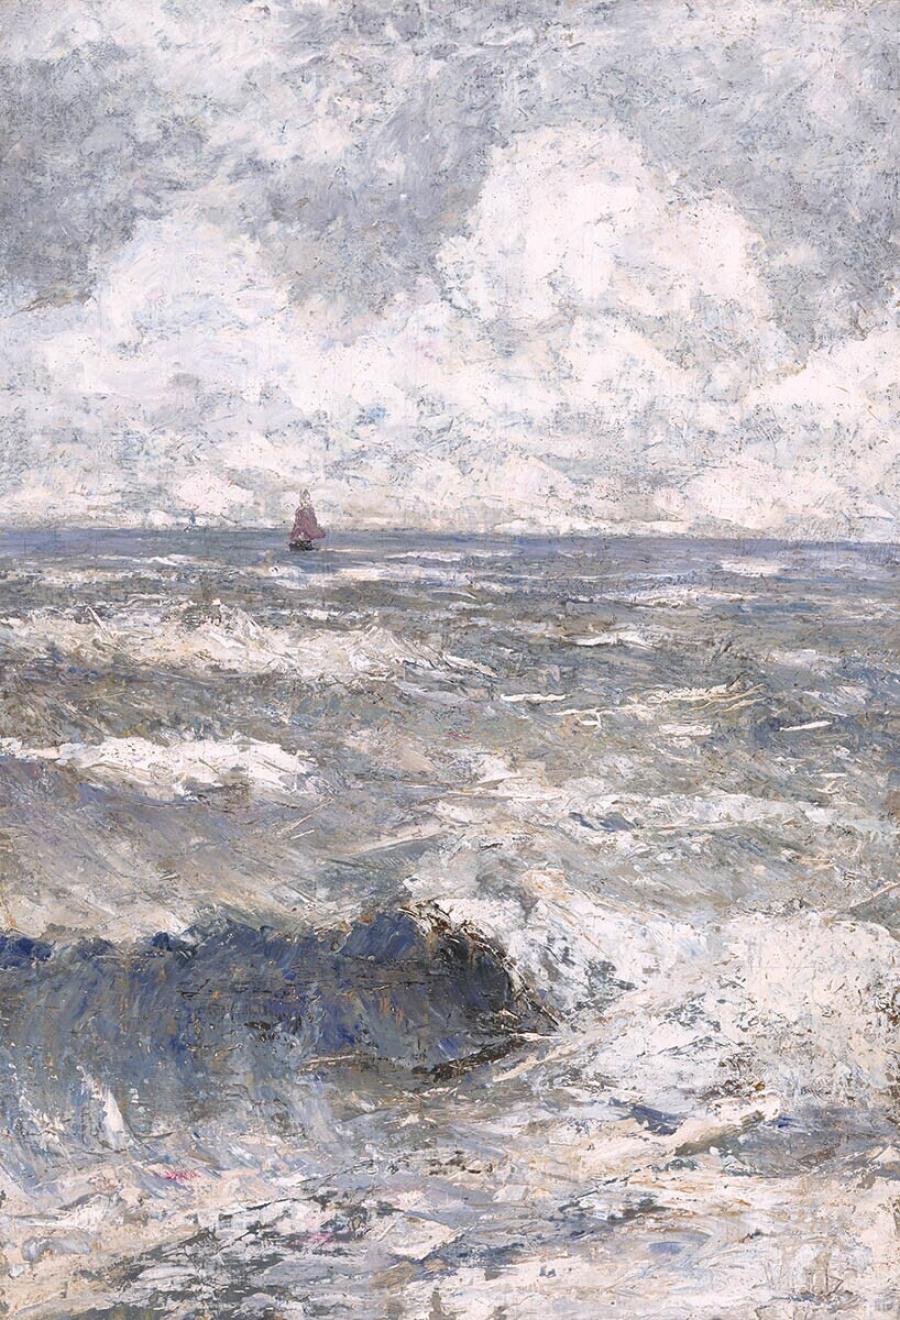 Sea (Brisants de la mer du Nord)